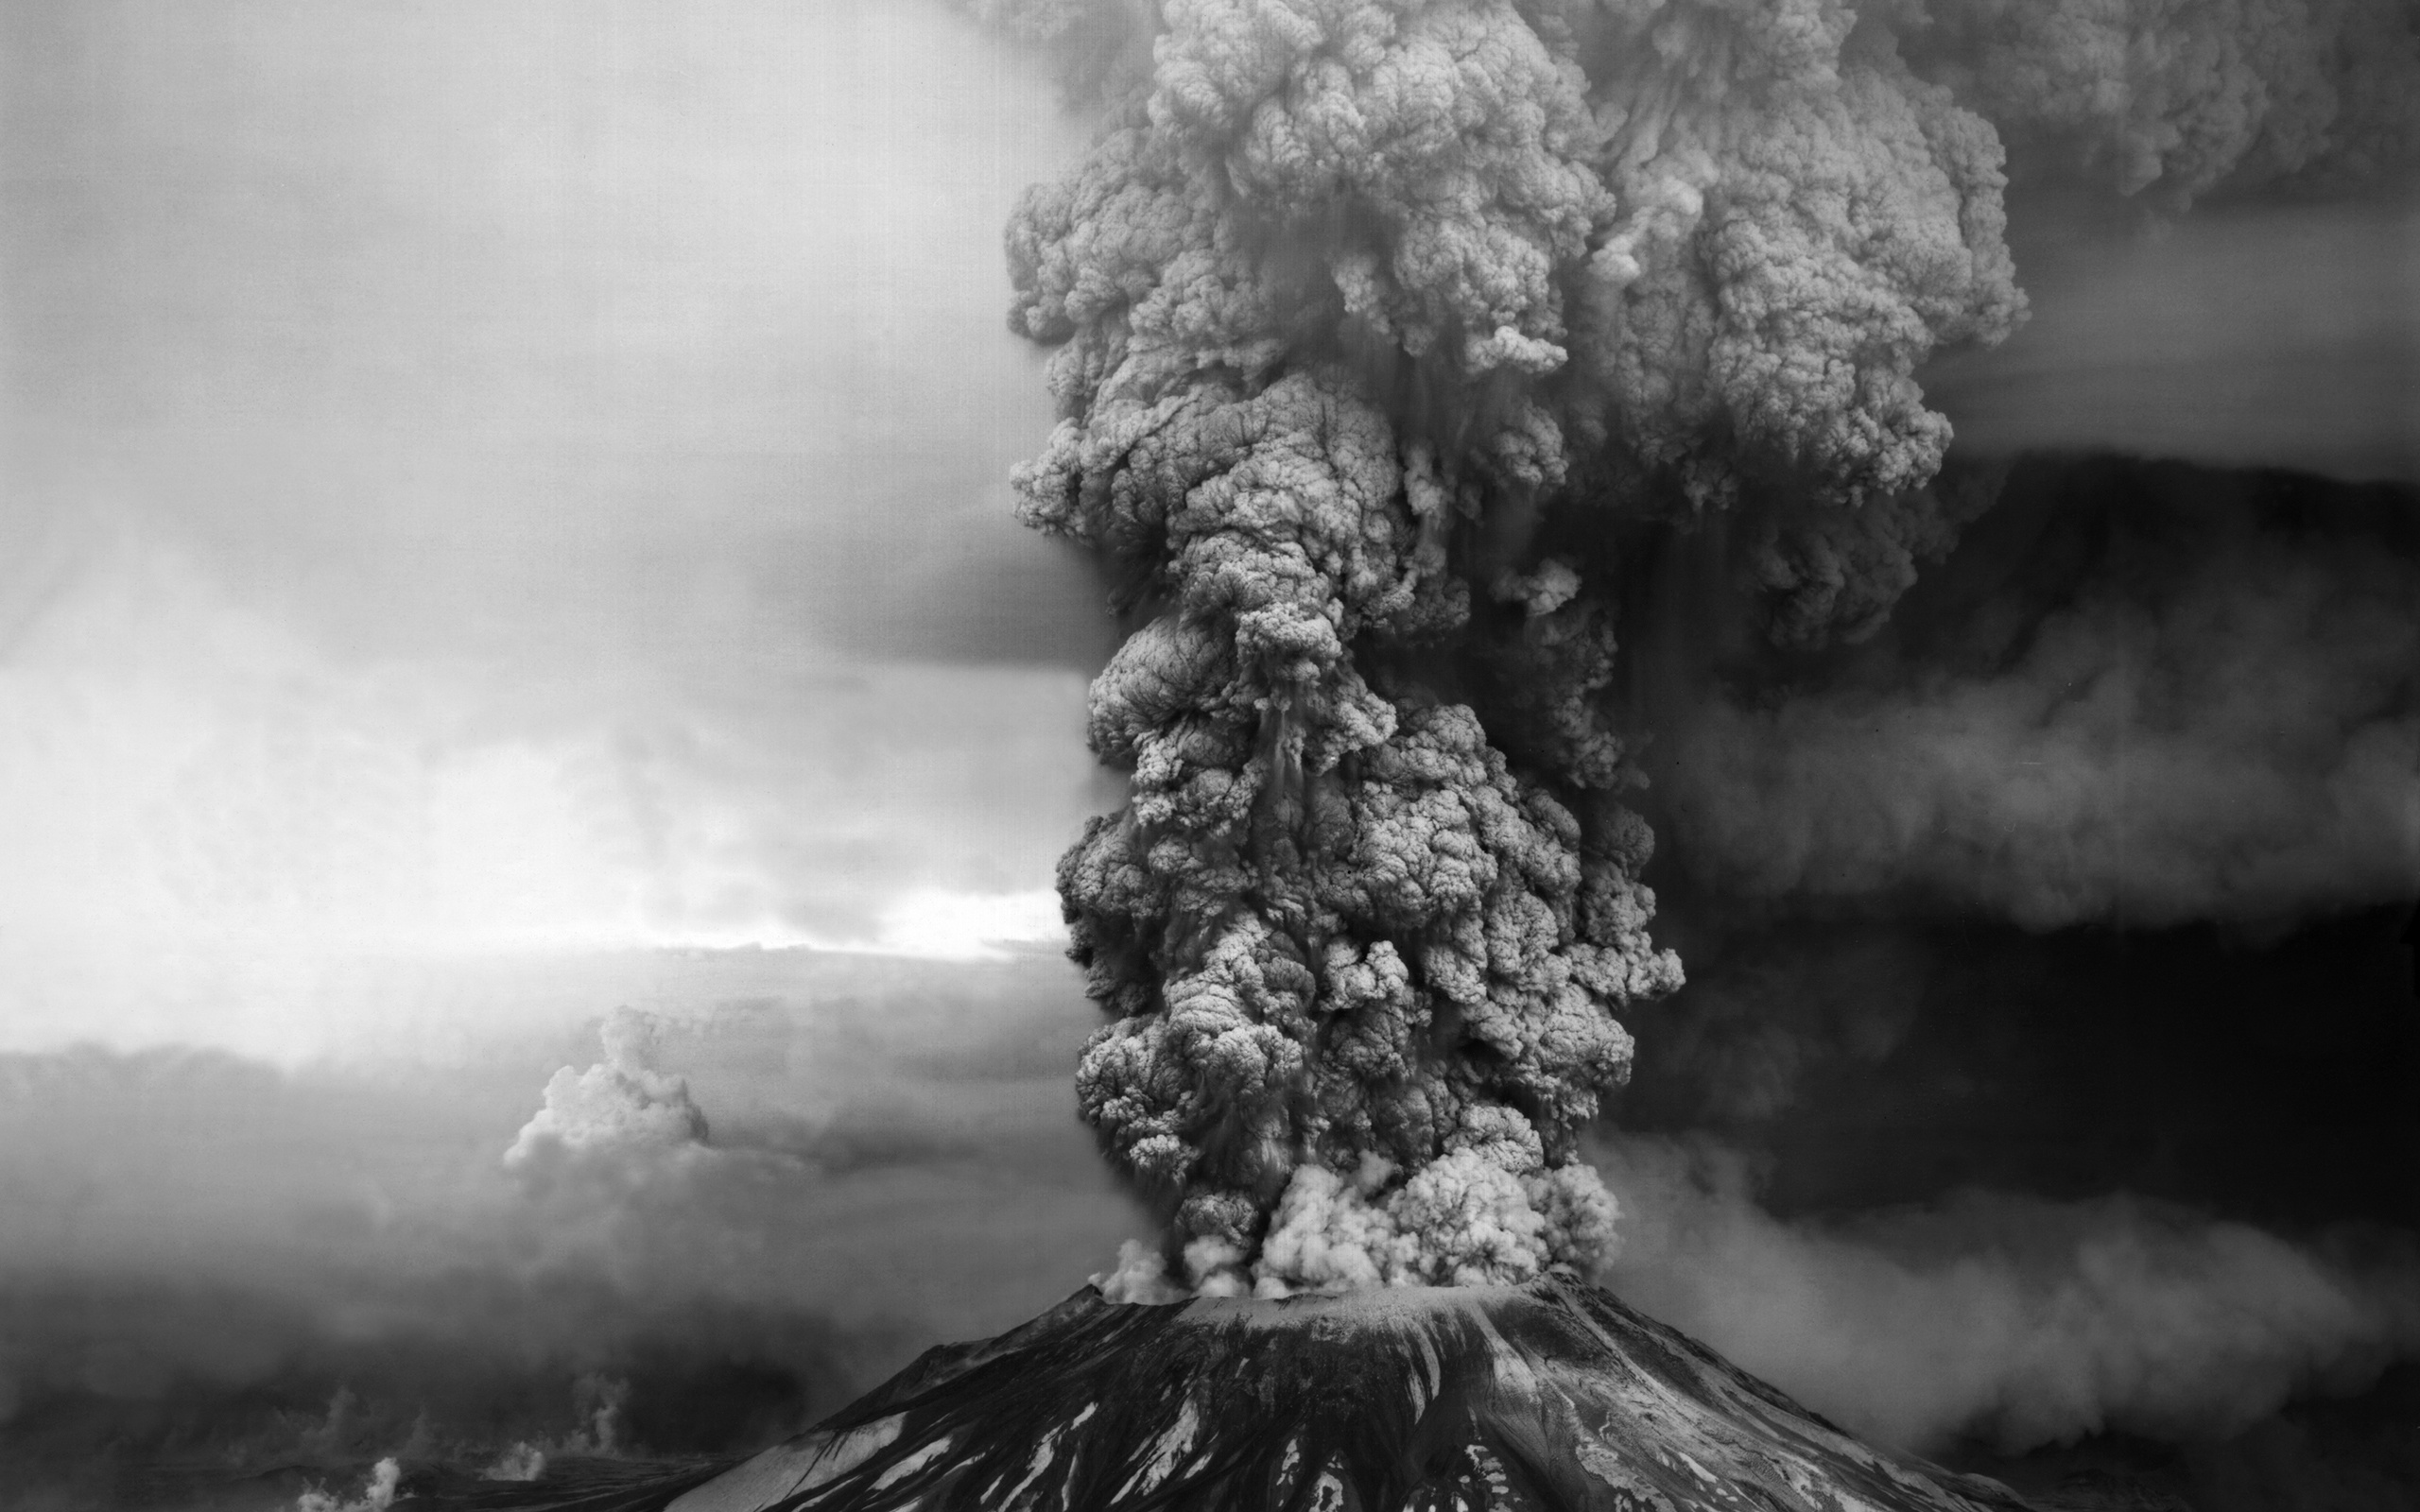 volcano smoke wallpaper - hd desktop wallpapers | 4k hd